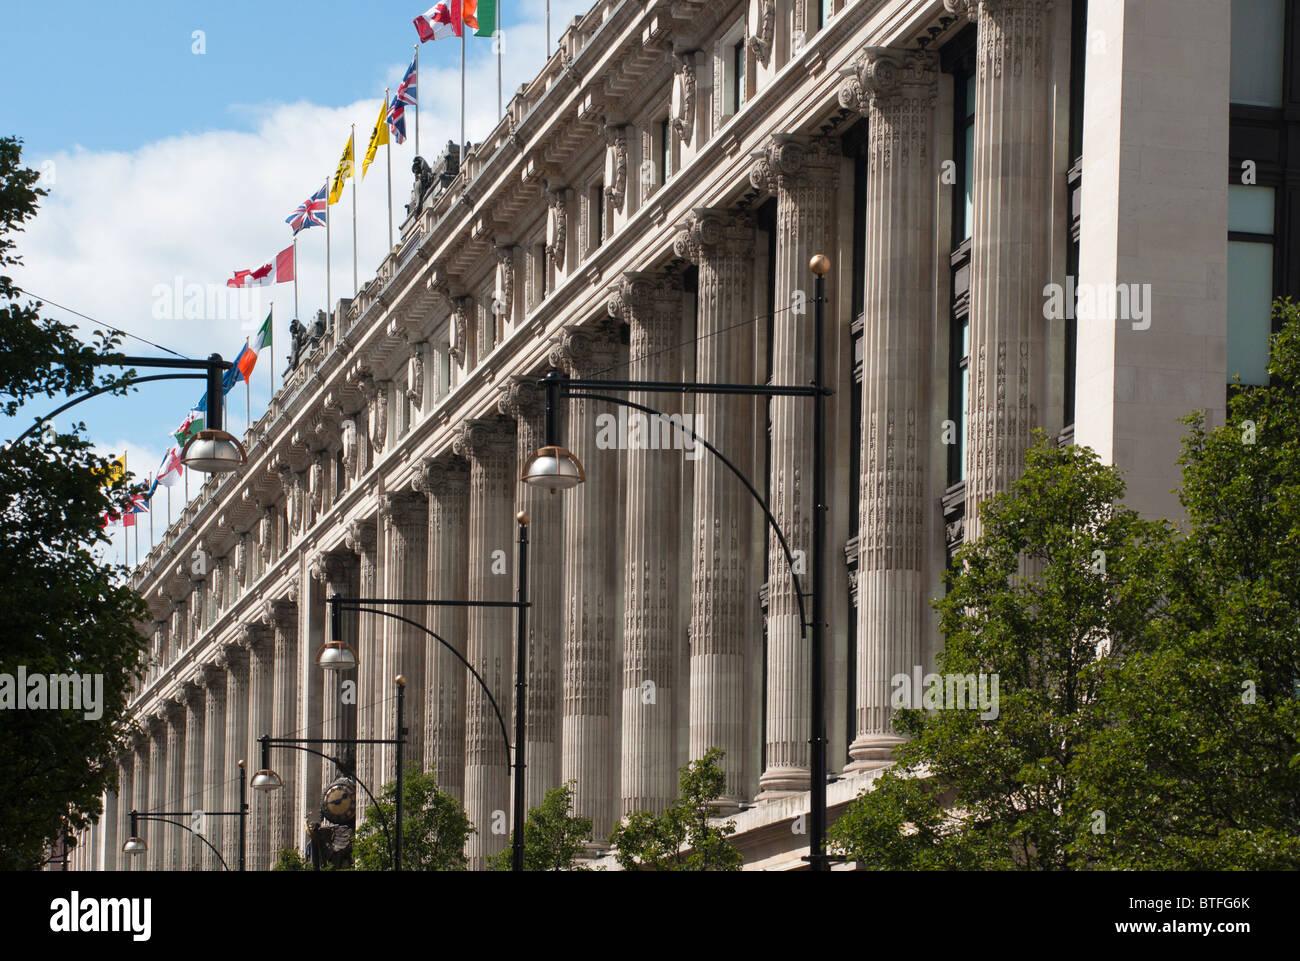 Selfridges department store in Oxford St, London, UK Stock Photo